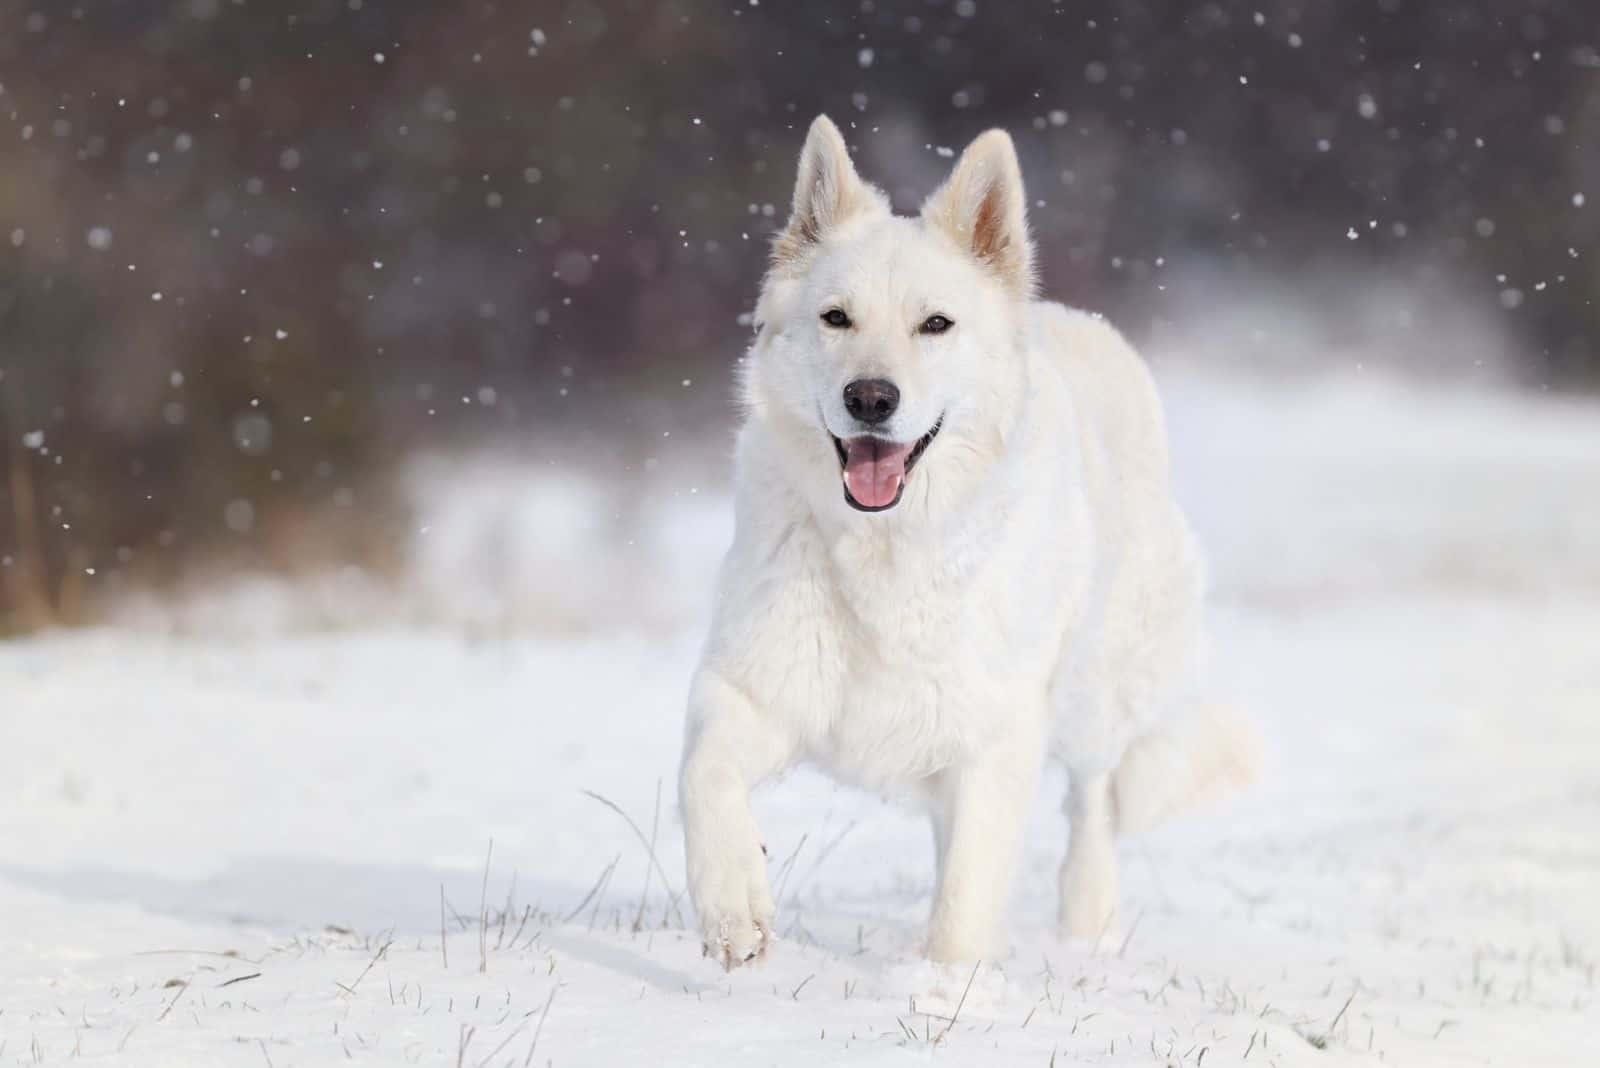 adorable white german shepherd dog running in the snow